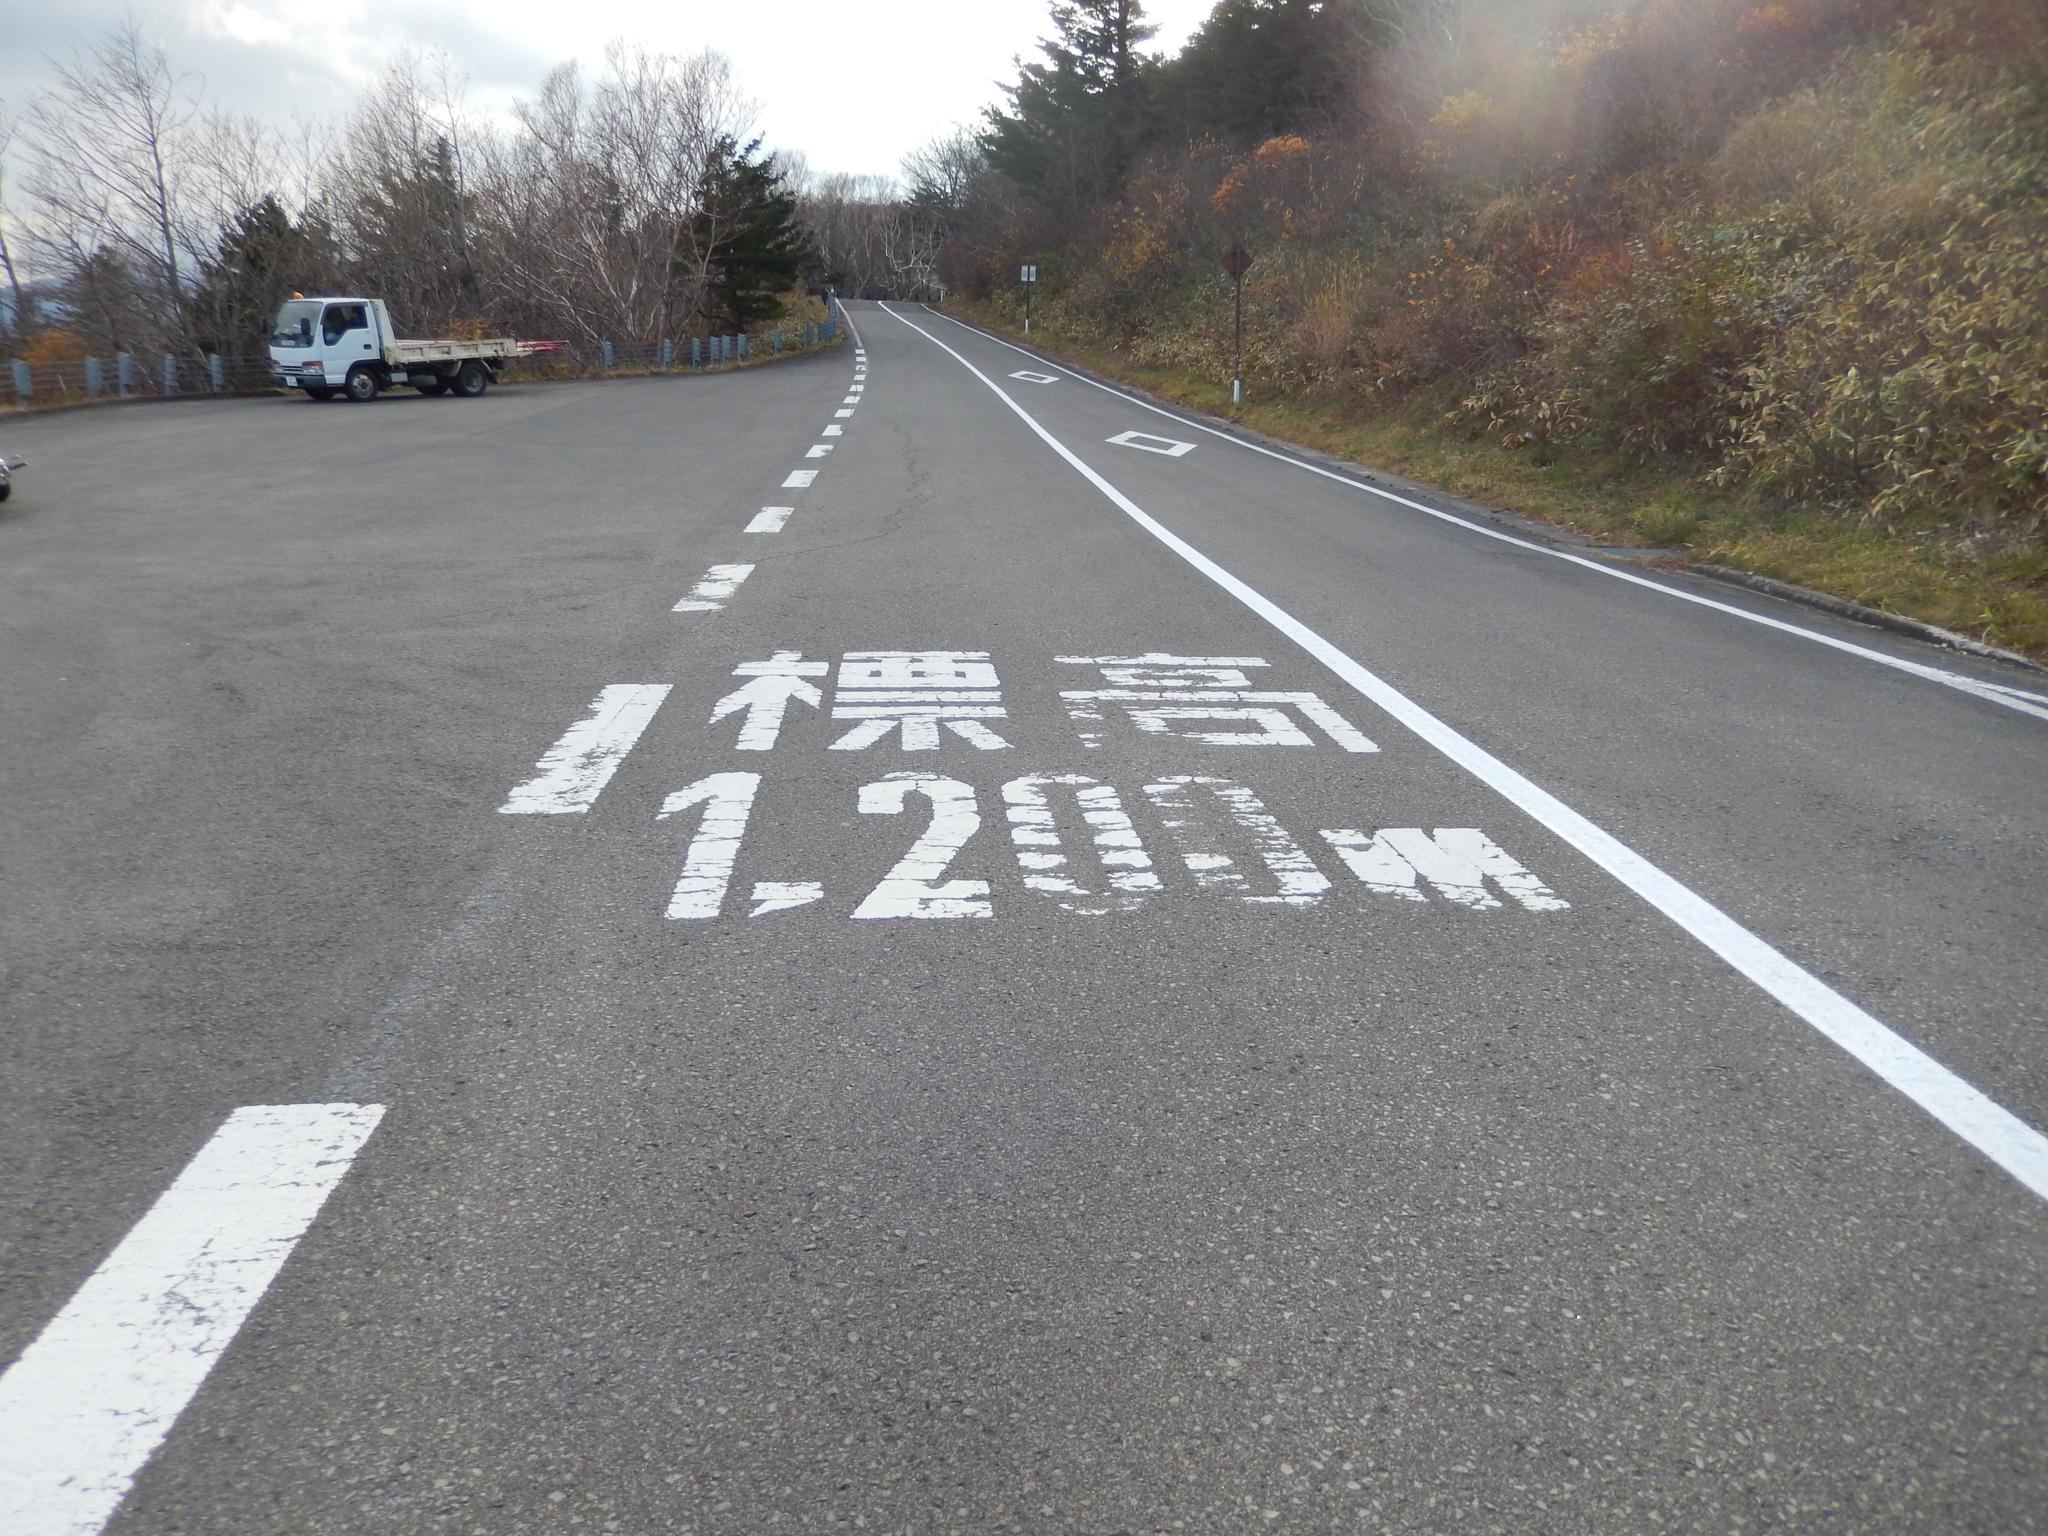 f:id:ToshUeno:20151106144005j:plain